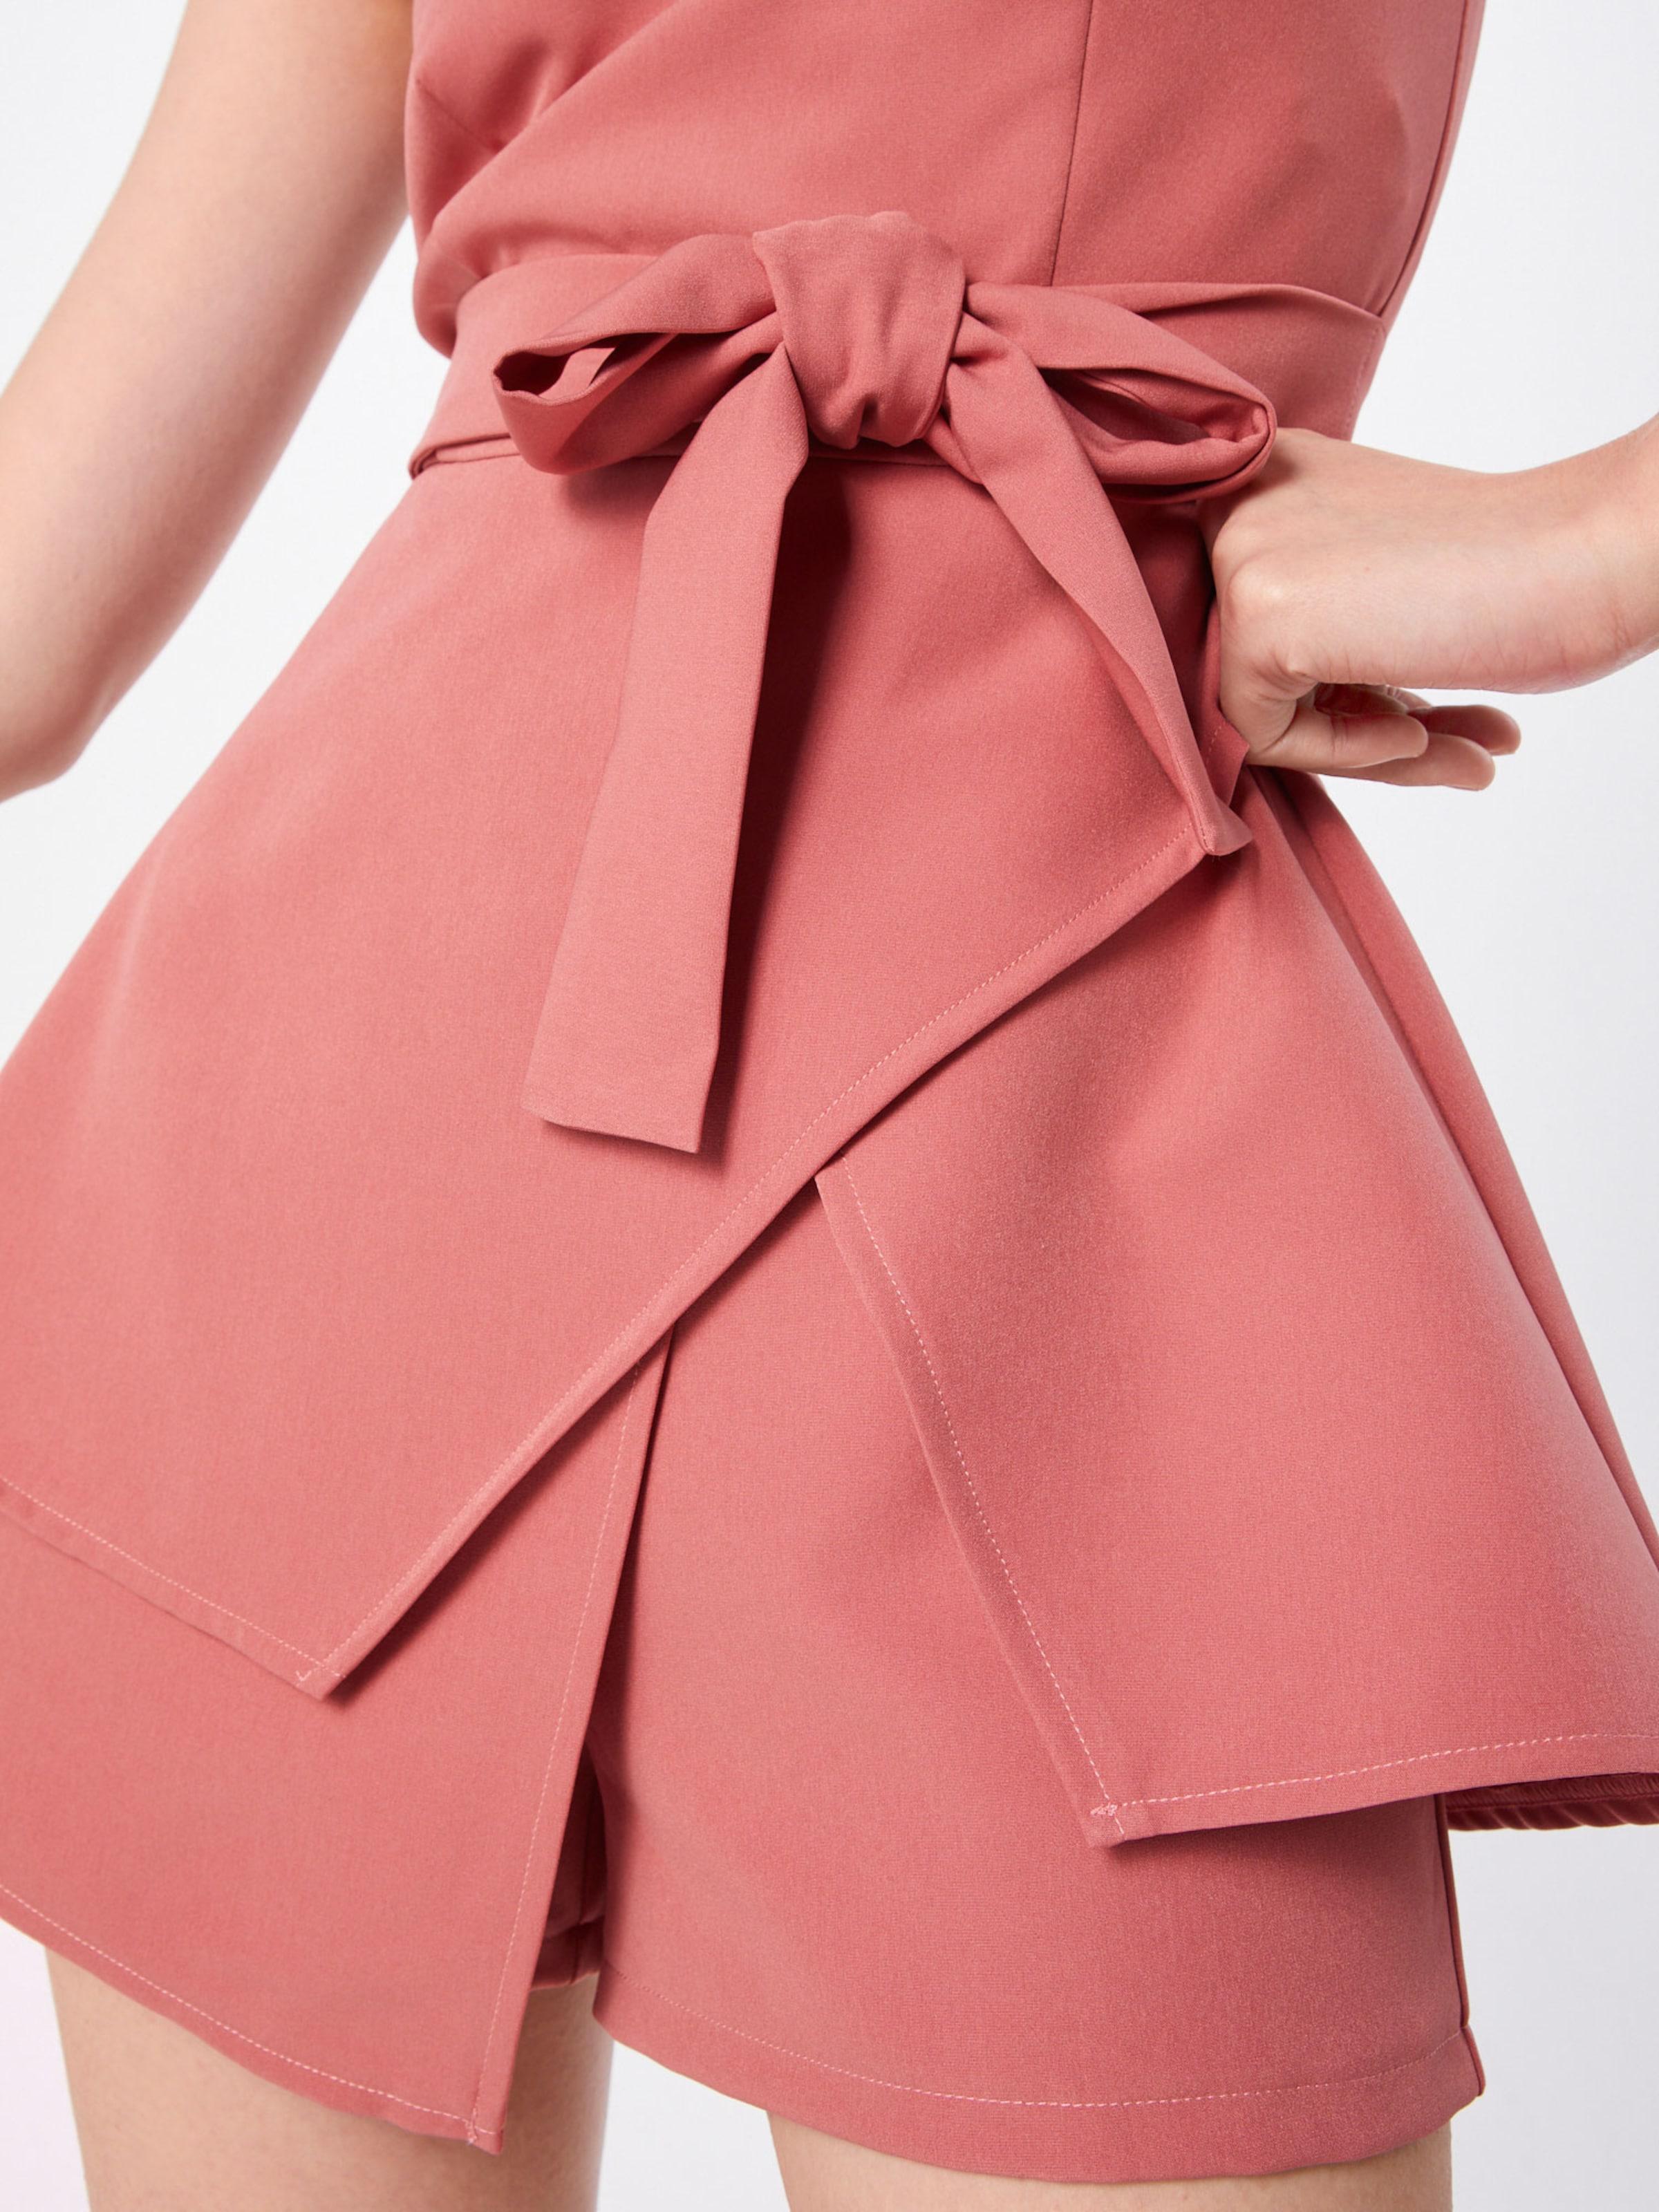 Missguided En Rose 'bandeau Combinaison Playsuit' IW9DHeE2Y